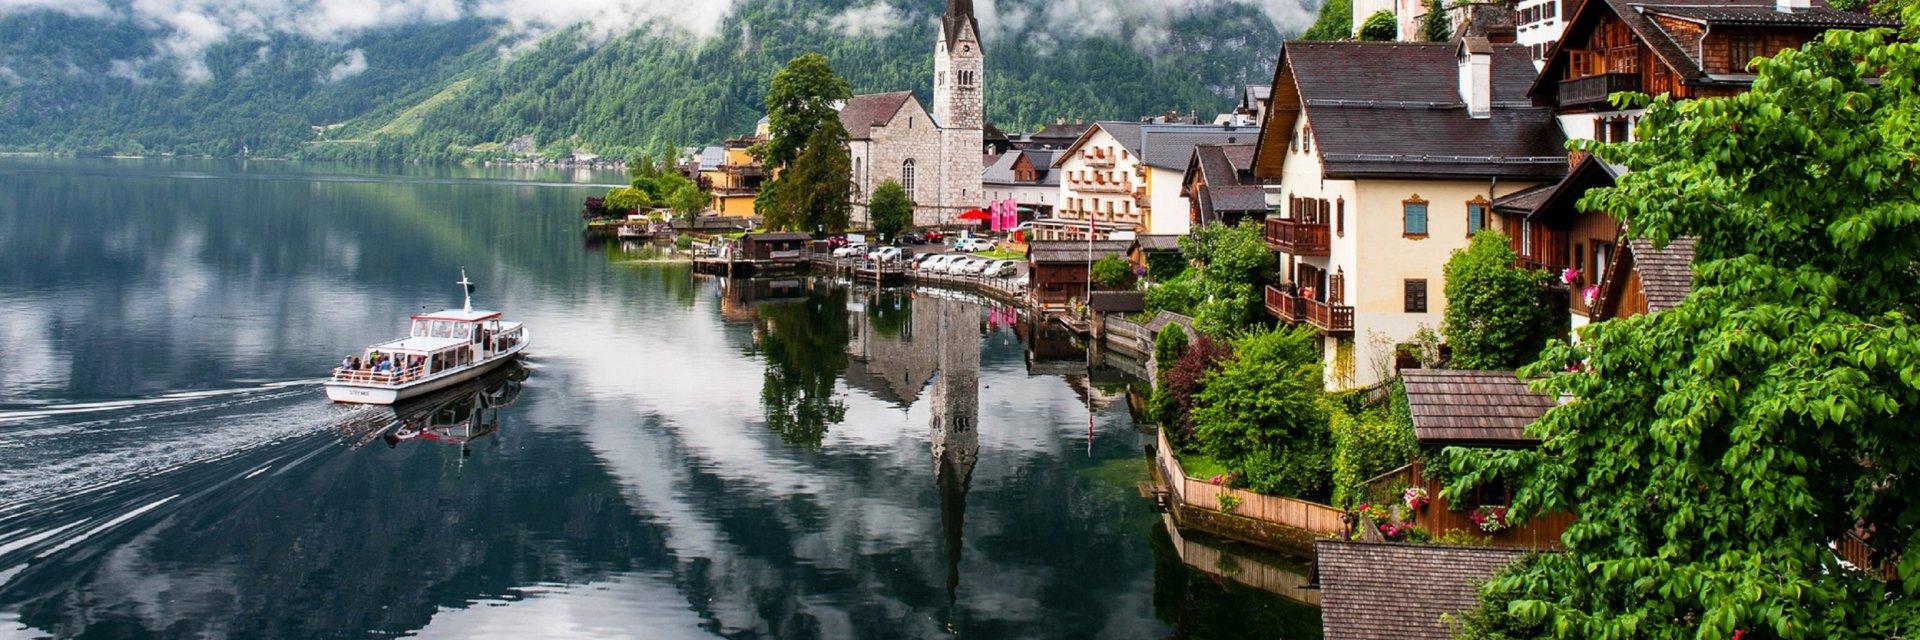 Chalet Gastein 3* (Бад Гаштайн, Австрия) - цены, отзывы, фото, бронирование - ПАКС